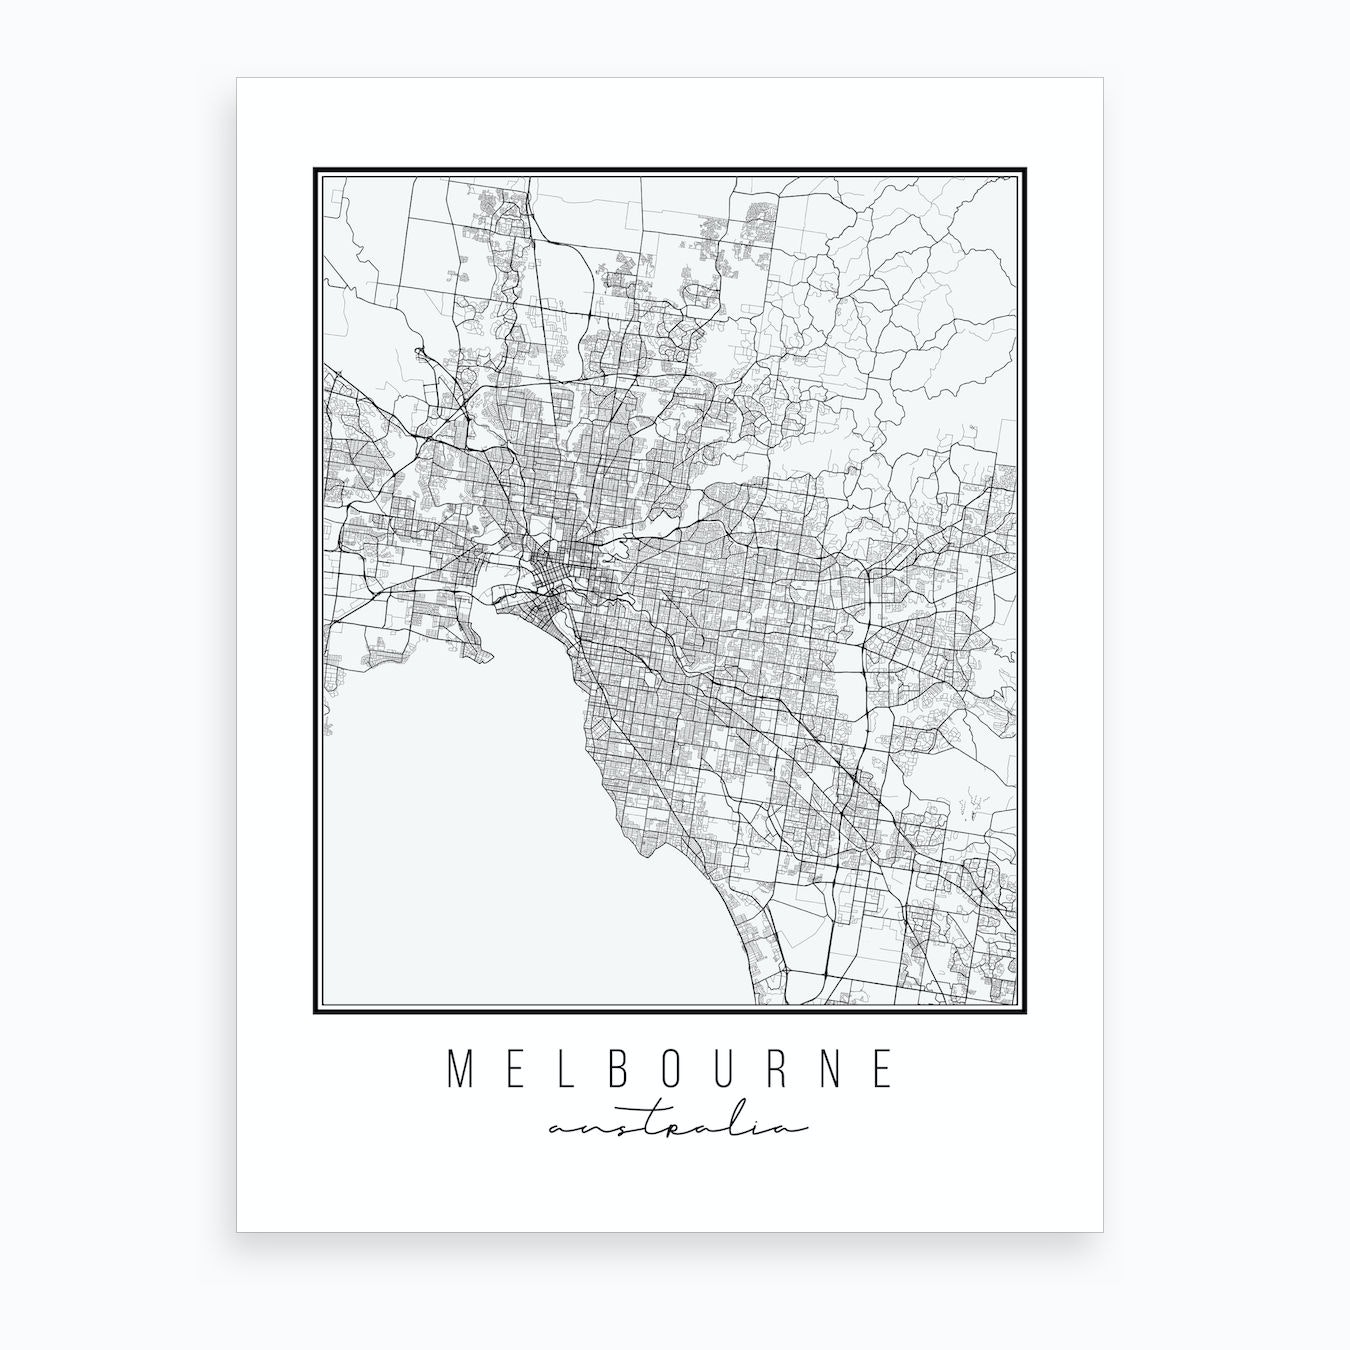 Melbourne Australia On A Map.Melbourne Australia Street Map Art Print